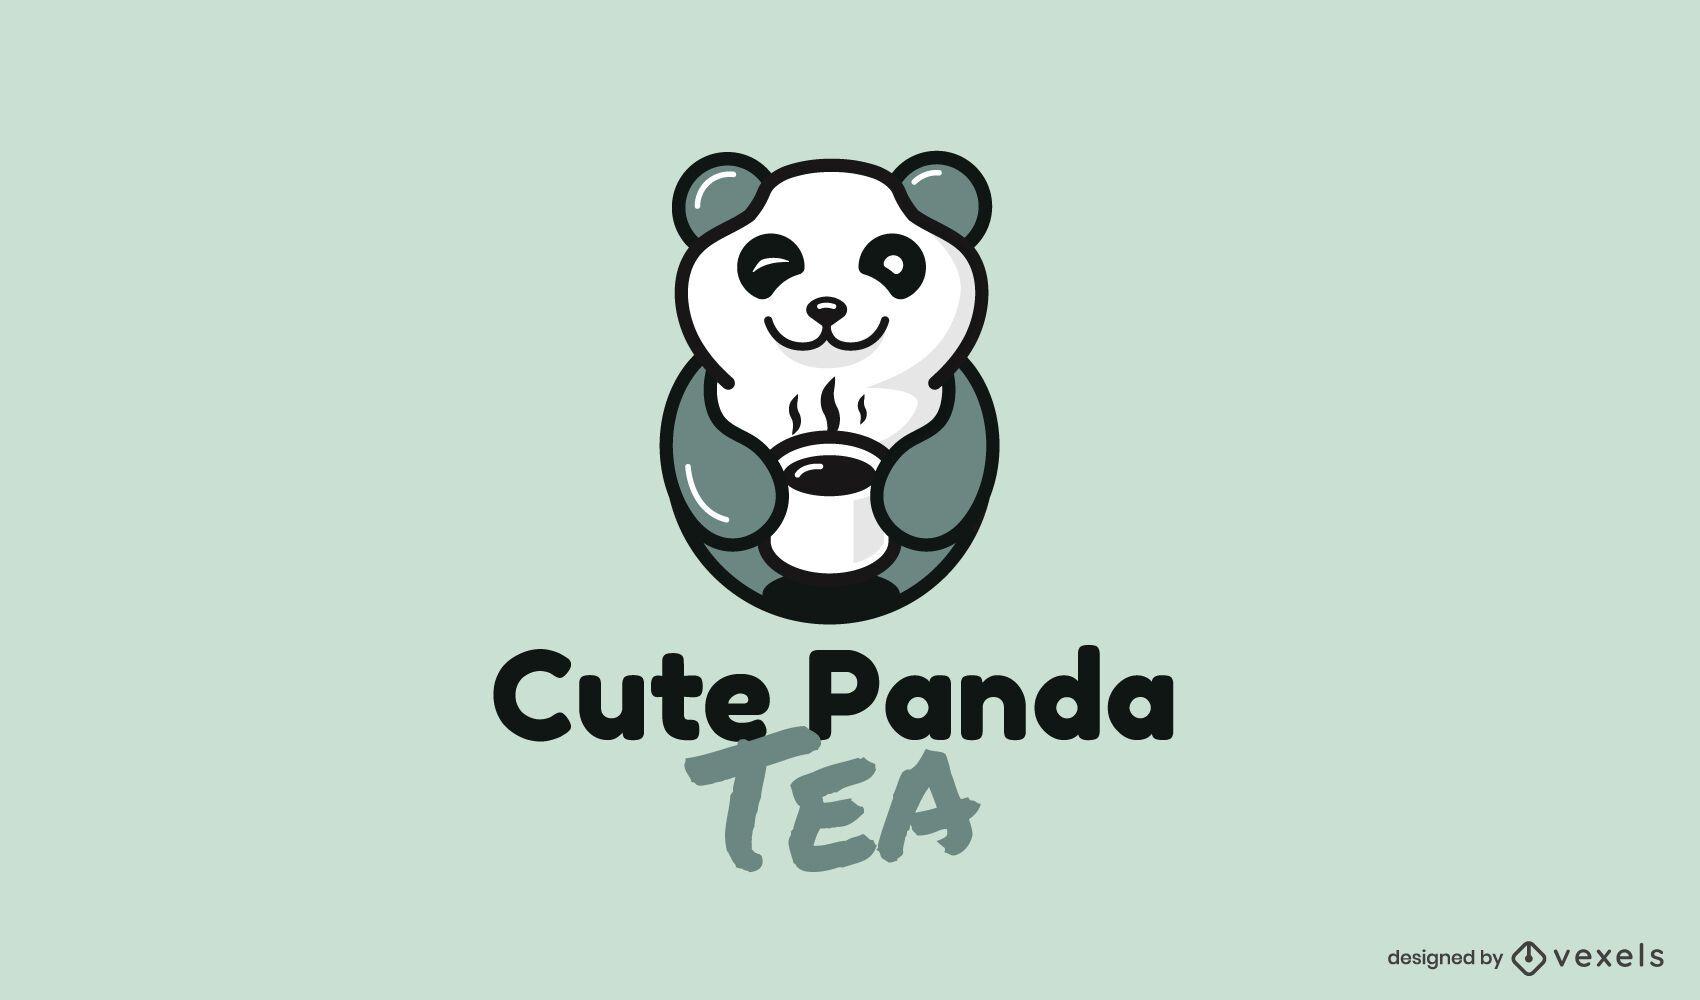 Projeto do logotipo do animal do urso panda bonito